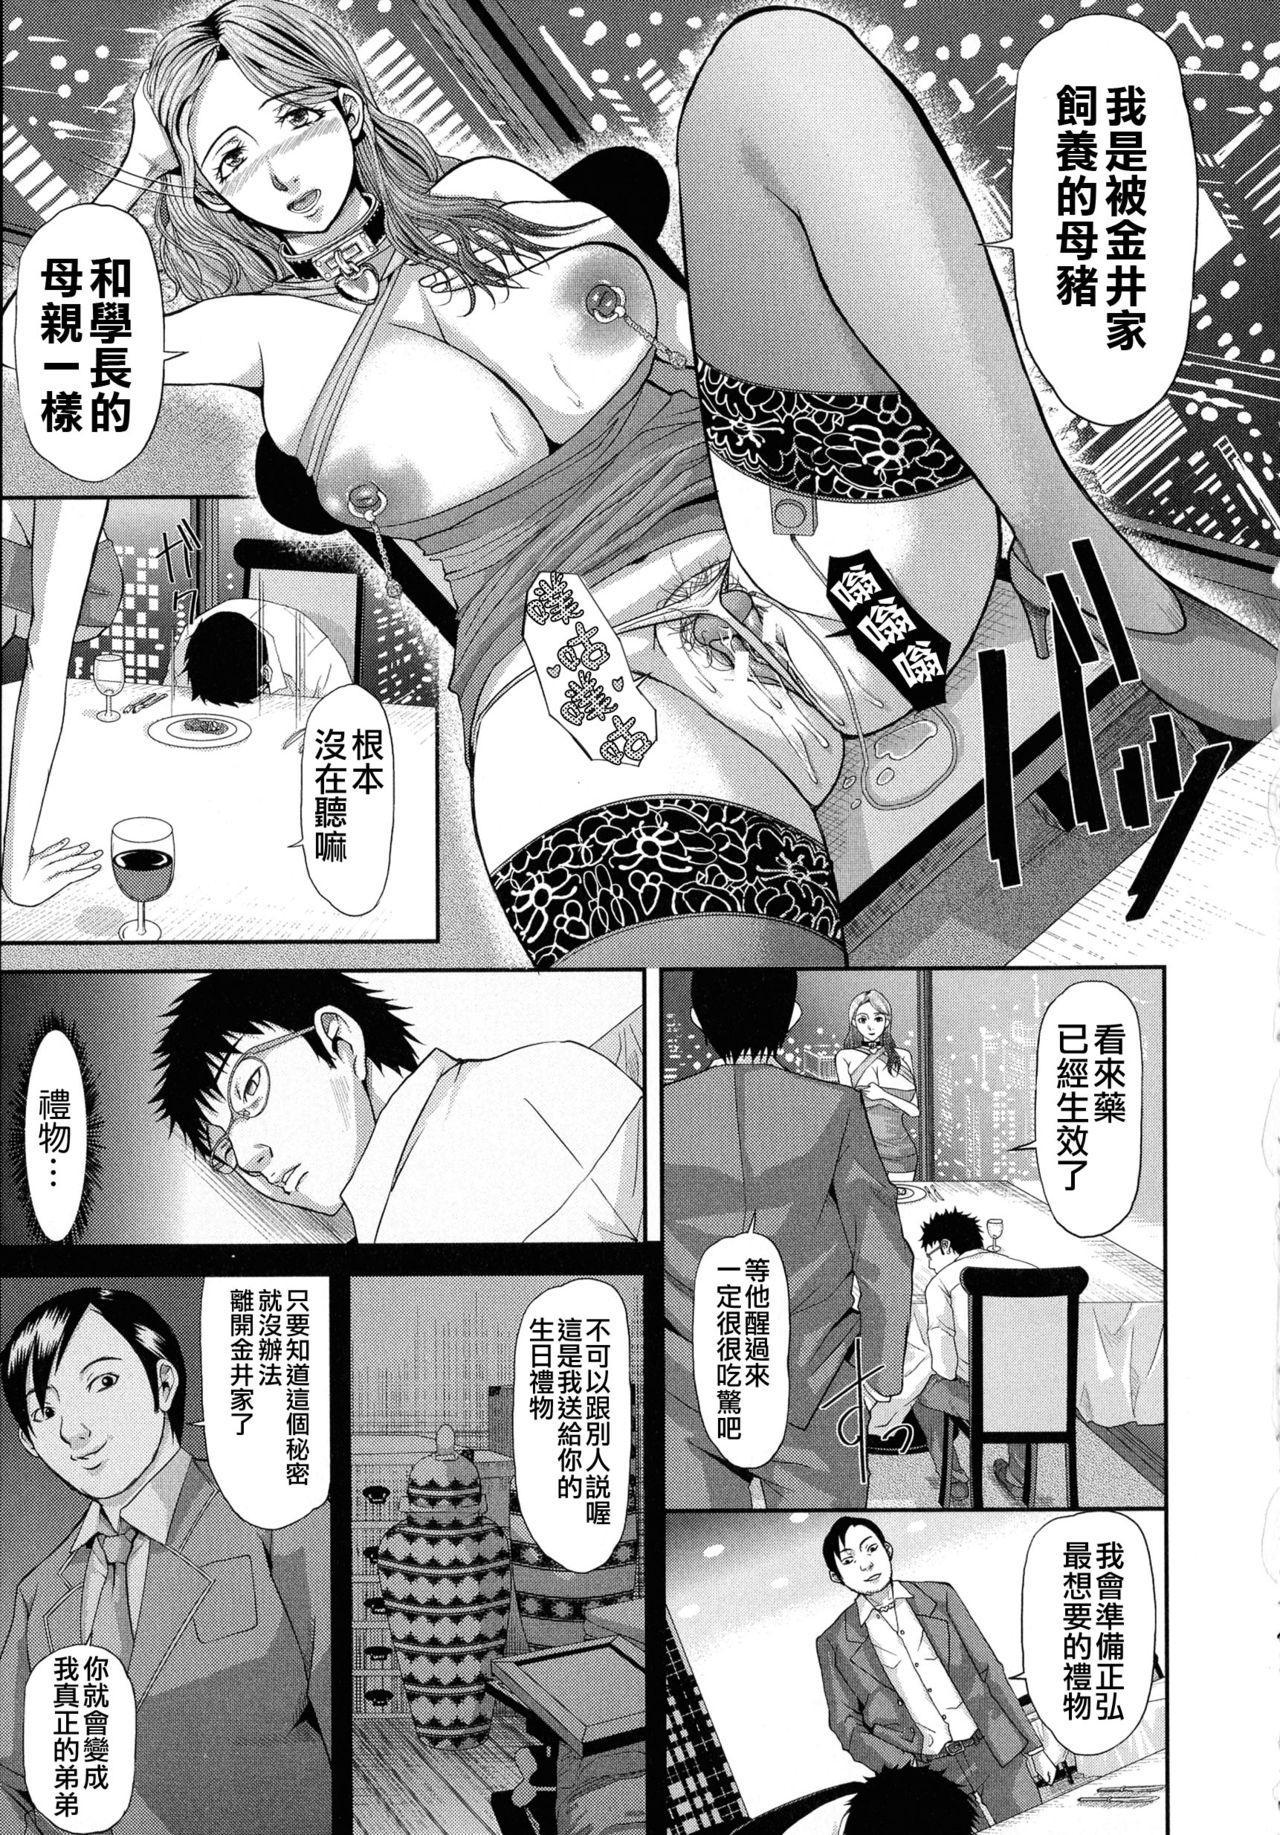 [Honebuto Danshaku] Innou Kaizou Program ~Oyako Zecchou Cult Ochi~ [Chinese]【不想记名重嵌--高质量图源】 125